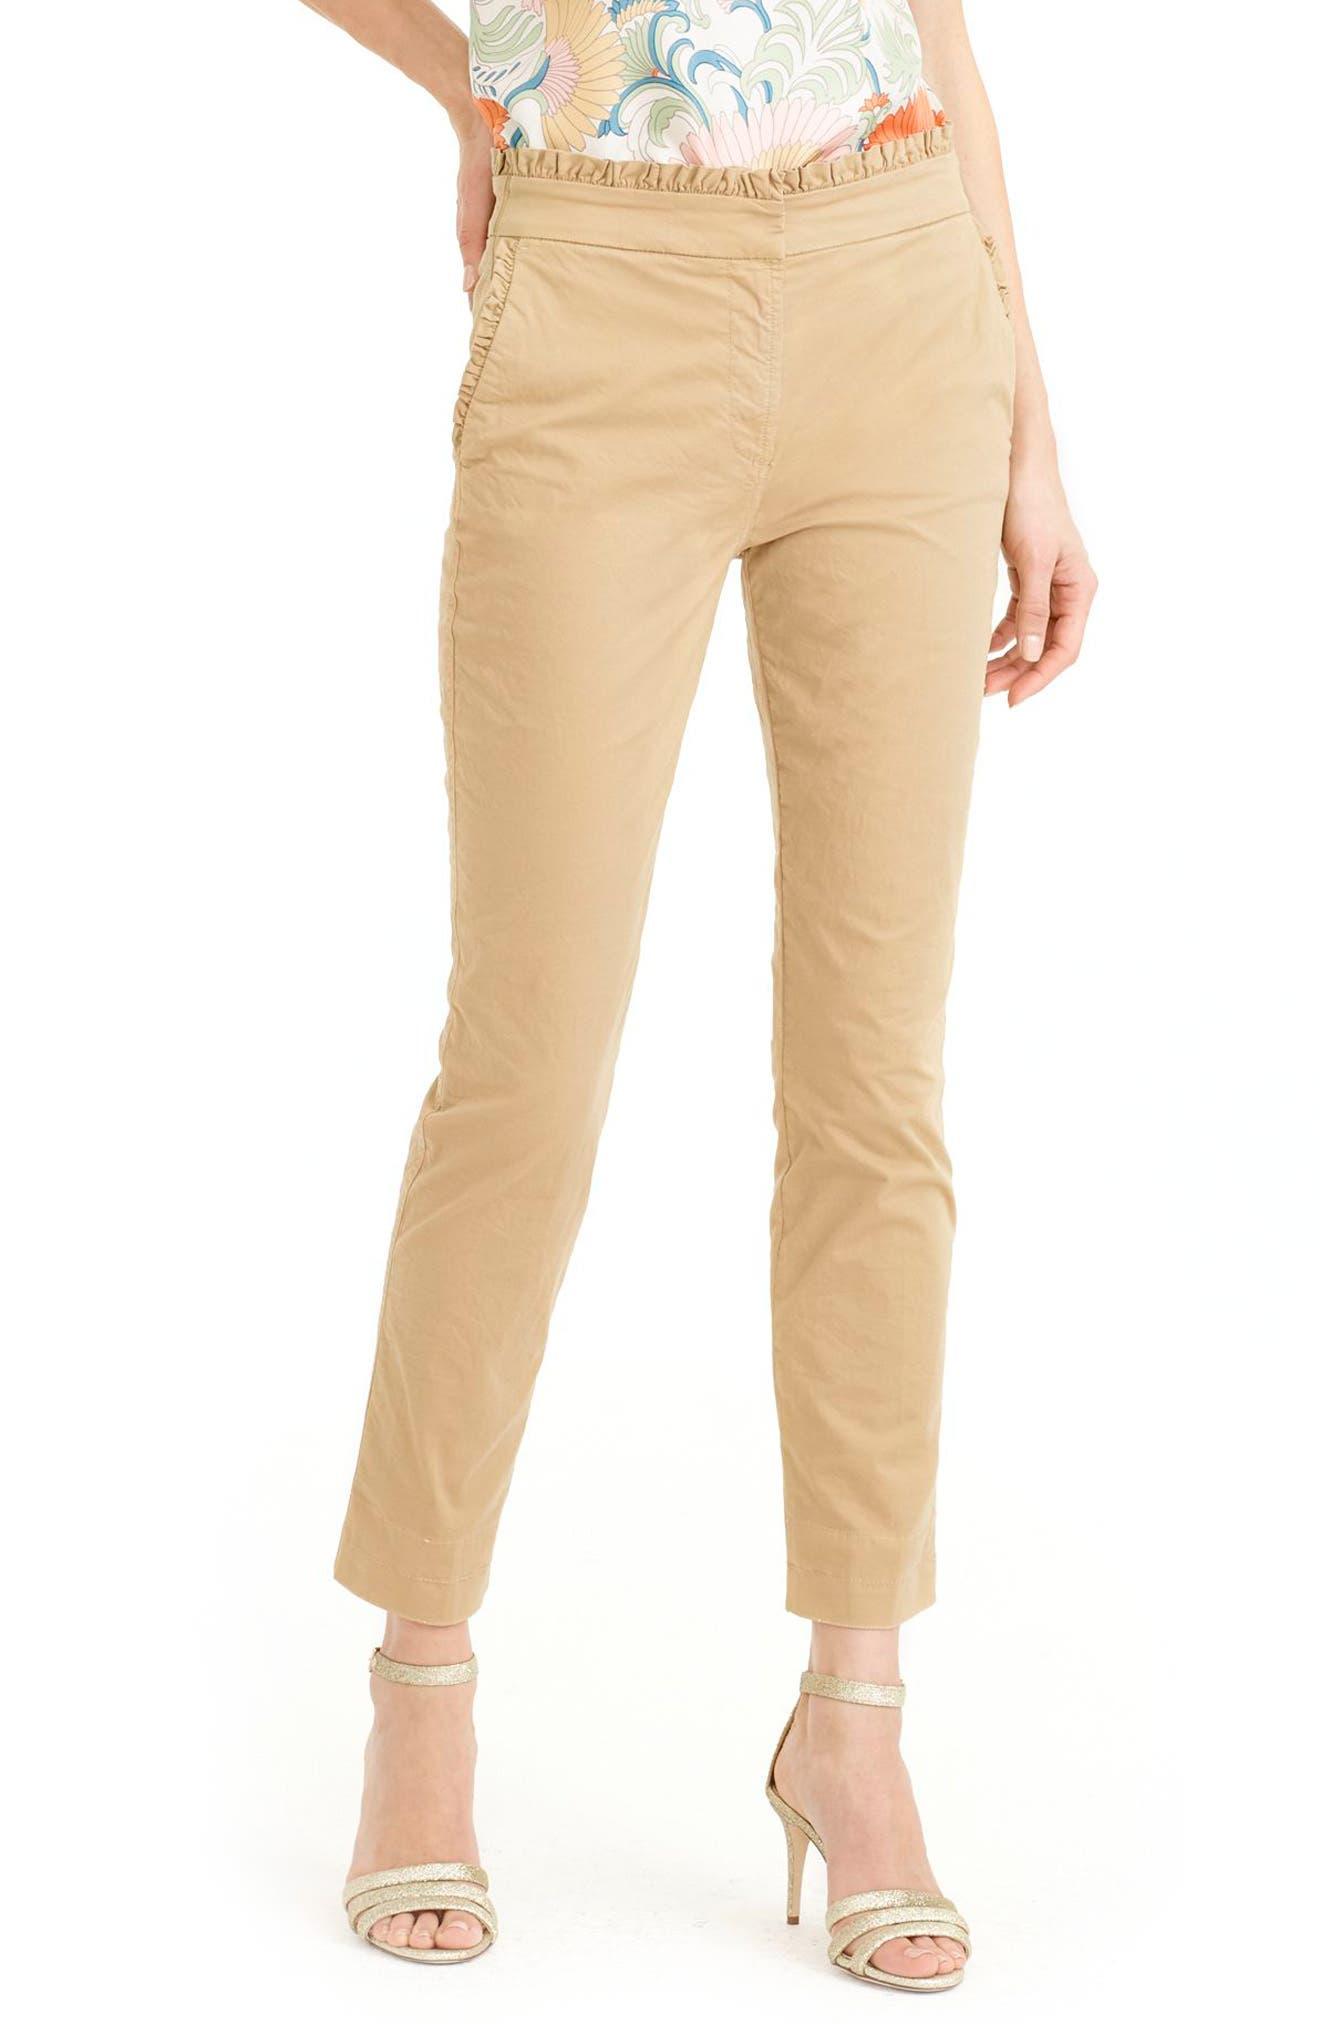 Alternate Image 1 Selected - J.Crew Ruffle Crop Chino Pants (Regular & Petite)